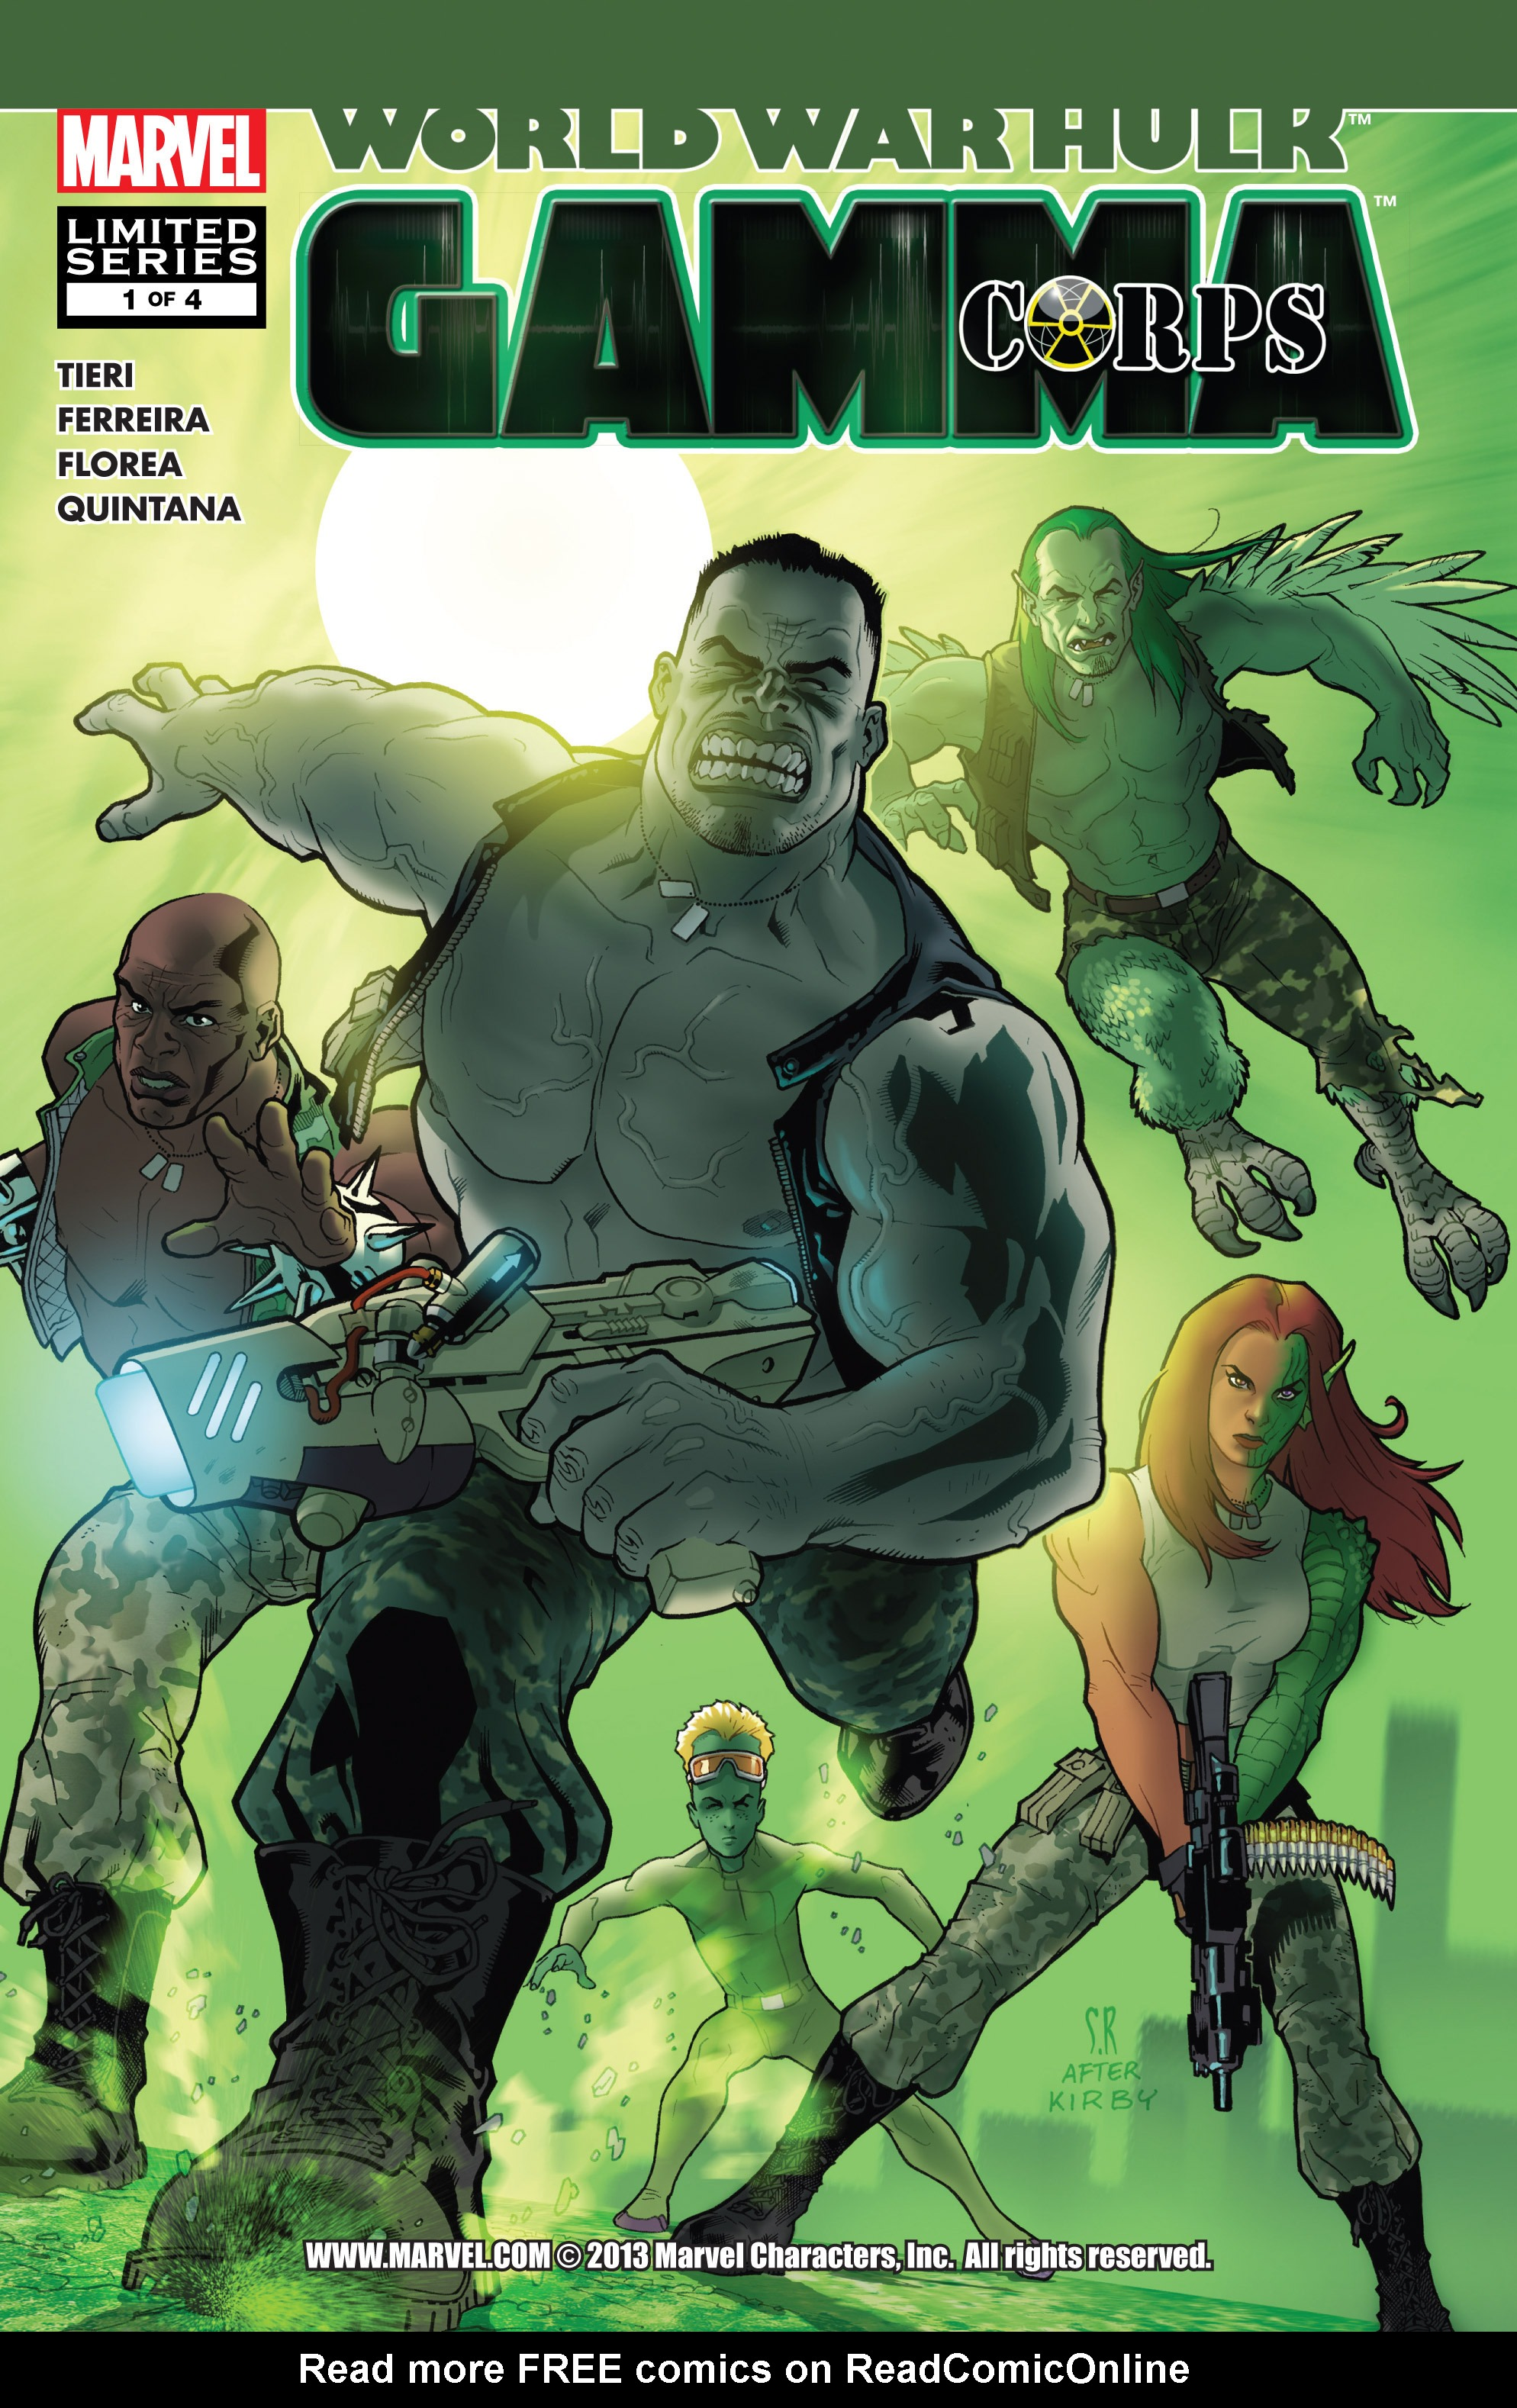 Read online World War Hulk: Gamma Corps comic -  Issue #1 - 1